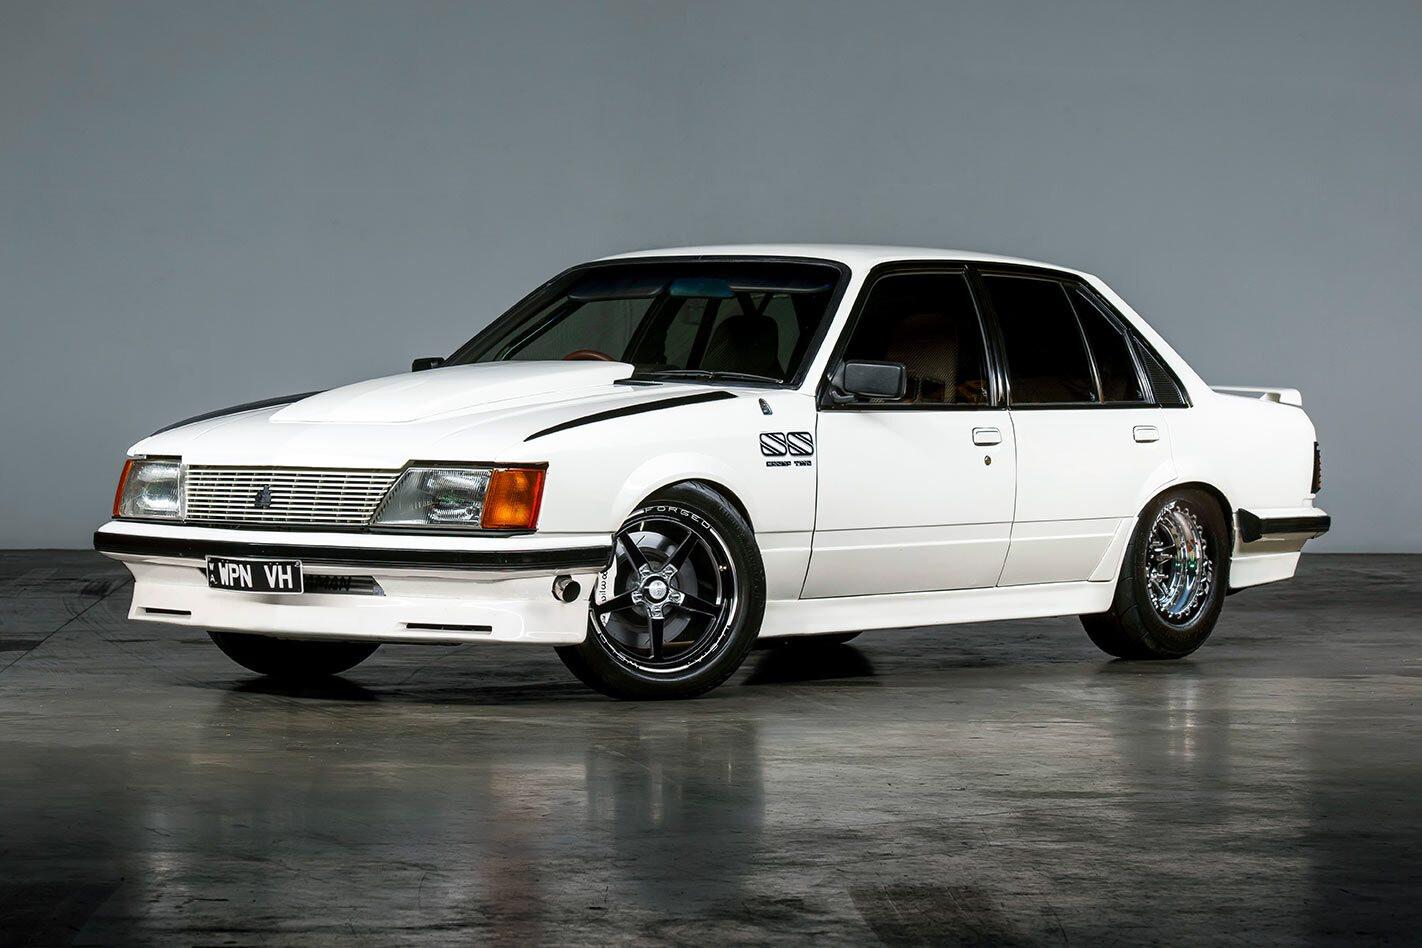 Holden Vh Commodore 4 B Jpg